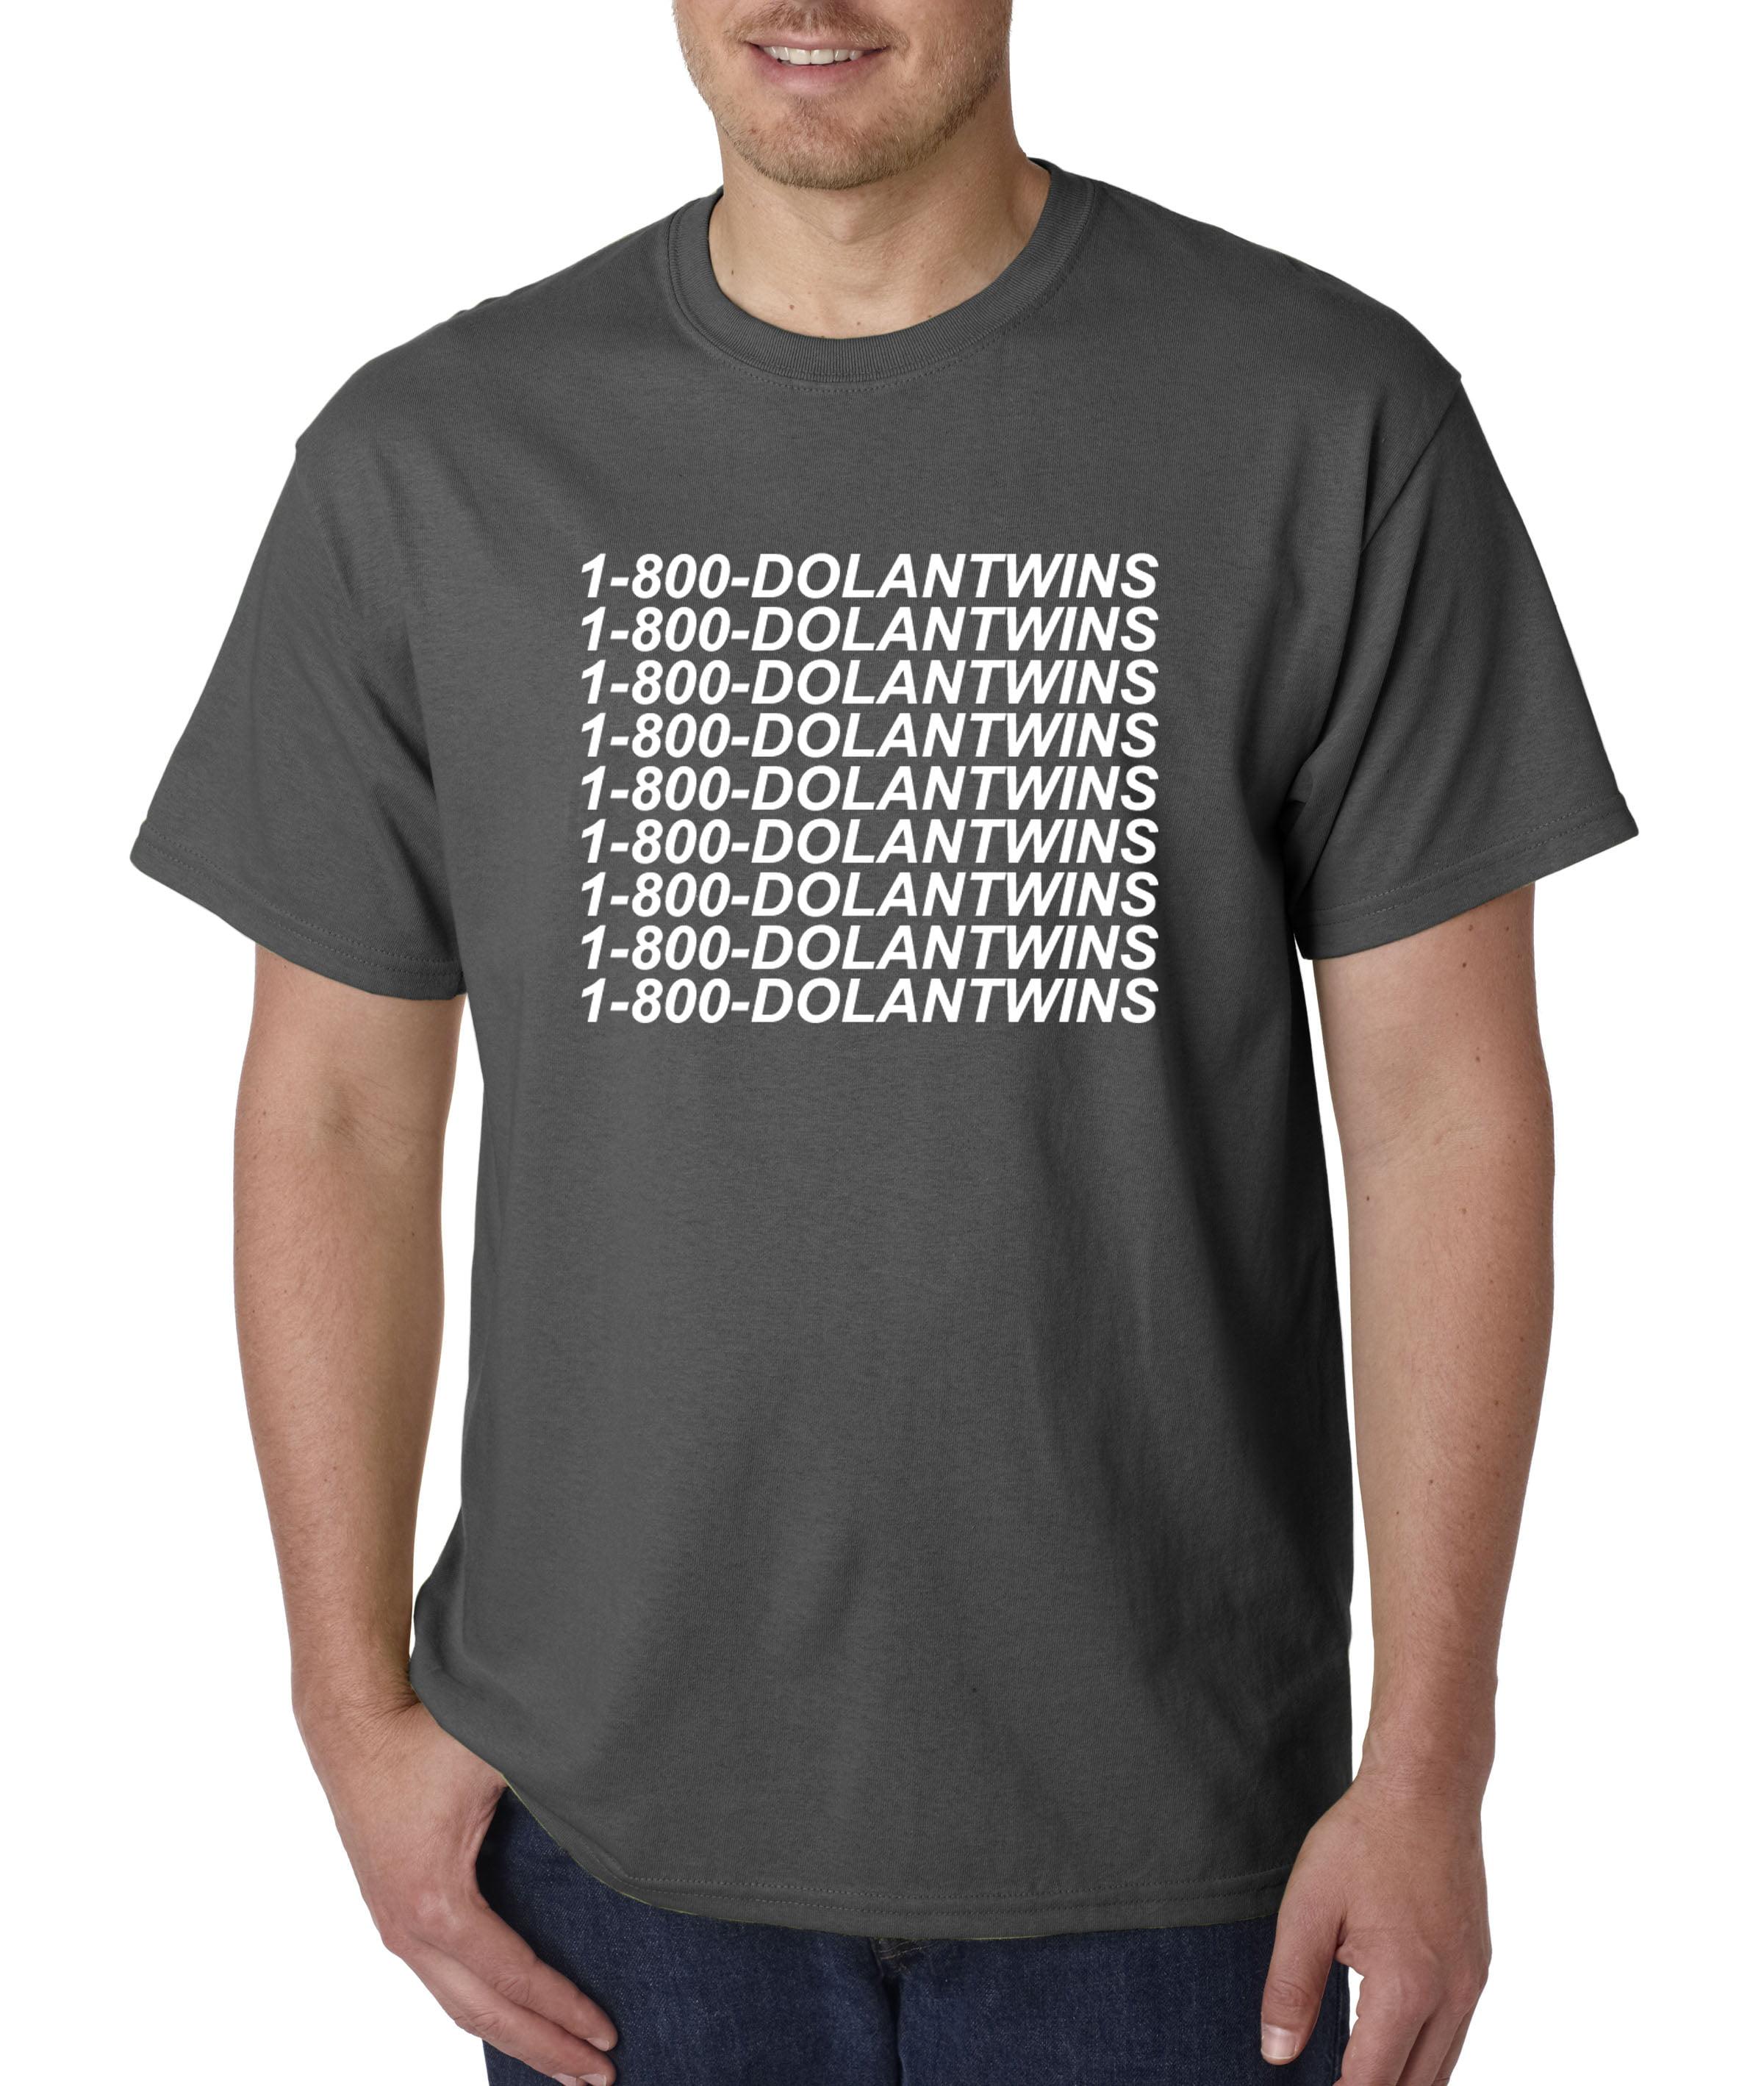 5cd02b708 New Way - 761 - Unisex T-Shirt 1-800-DOLANTWINS Dolan Twins Hotline Bling  2XL Charcoal - Walmart.com